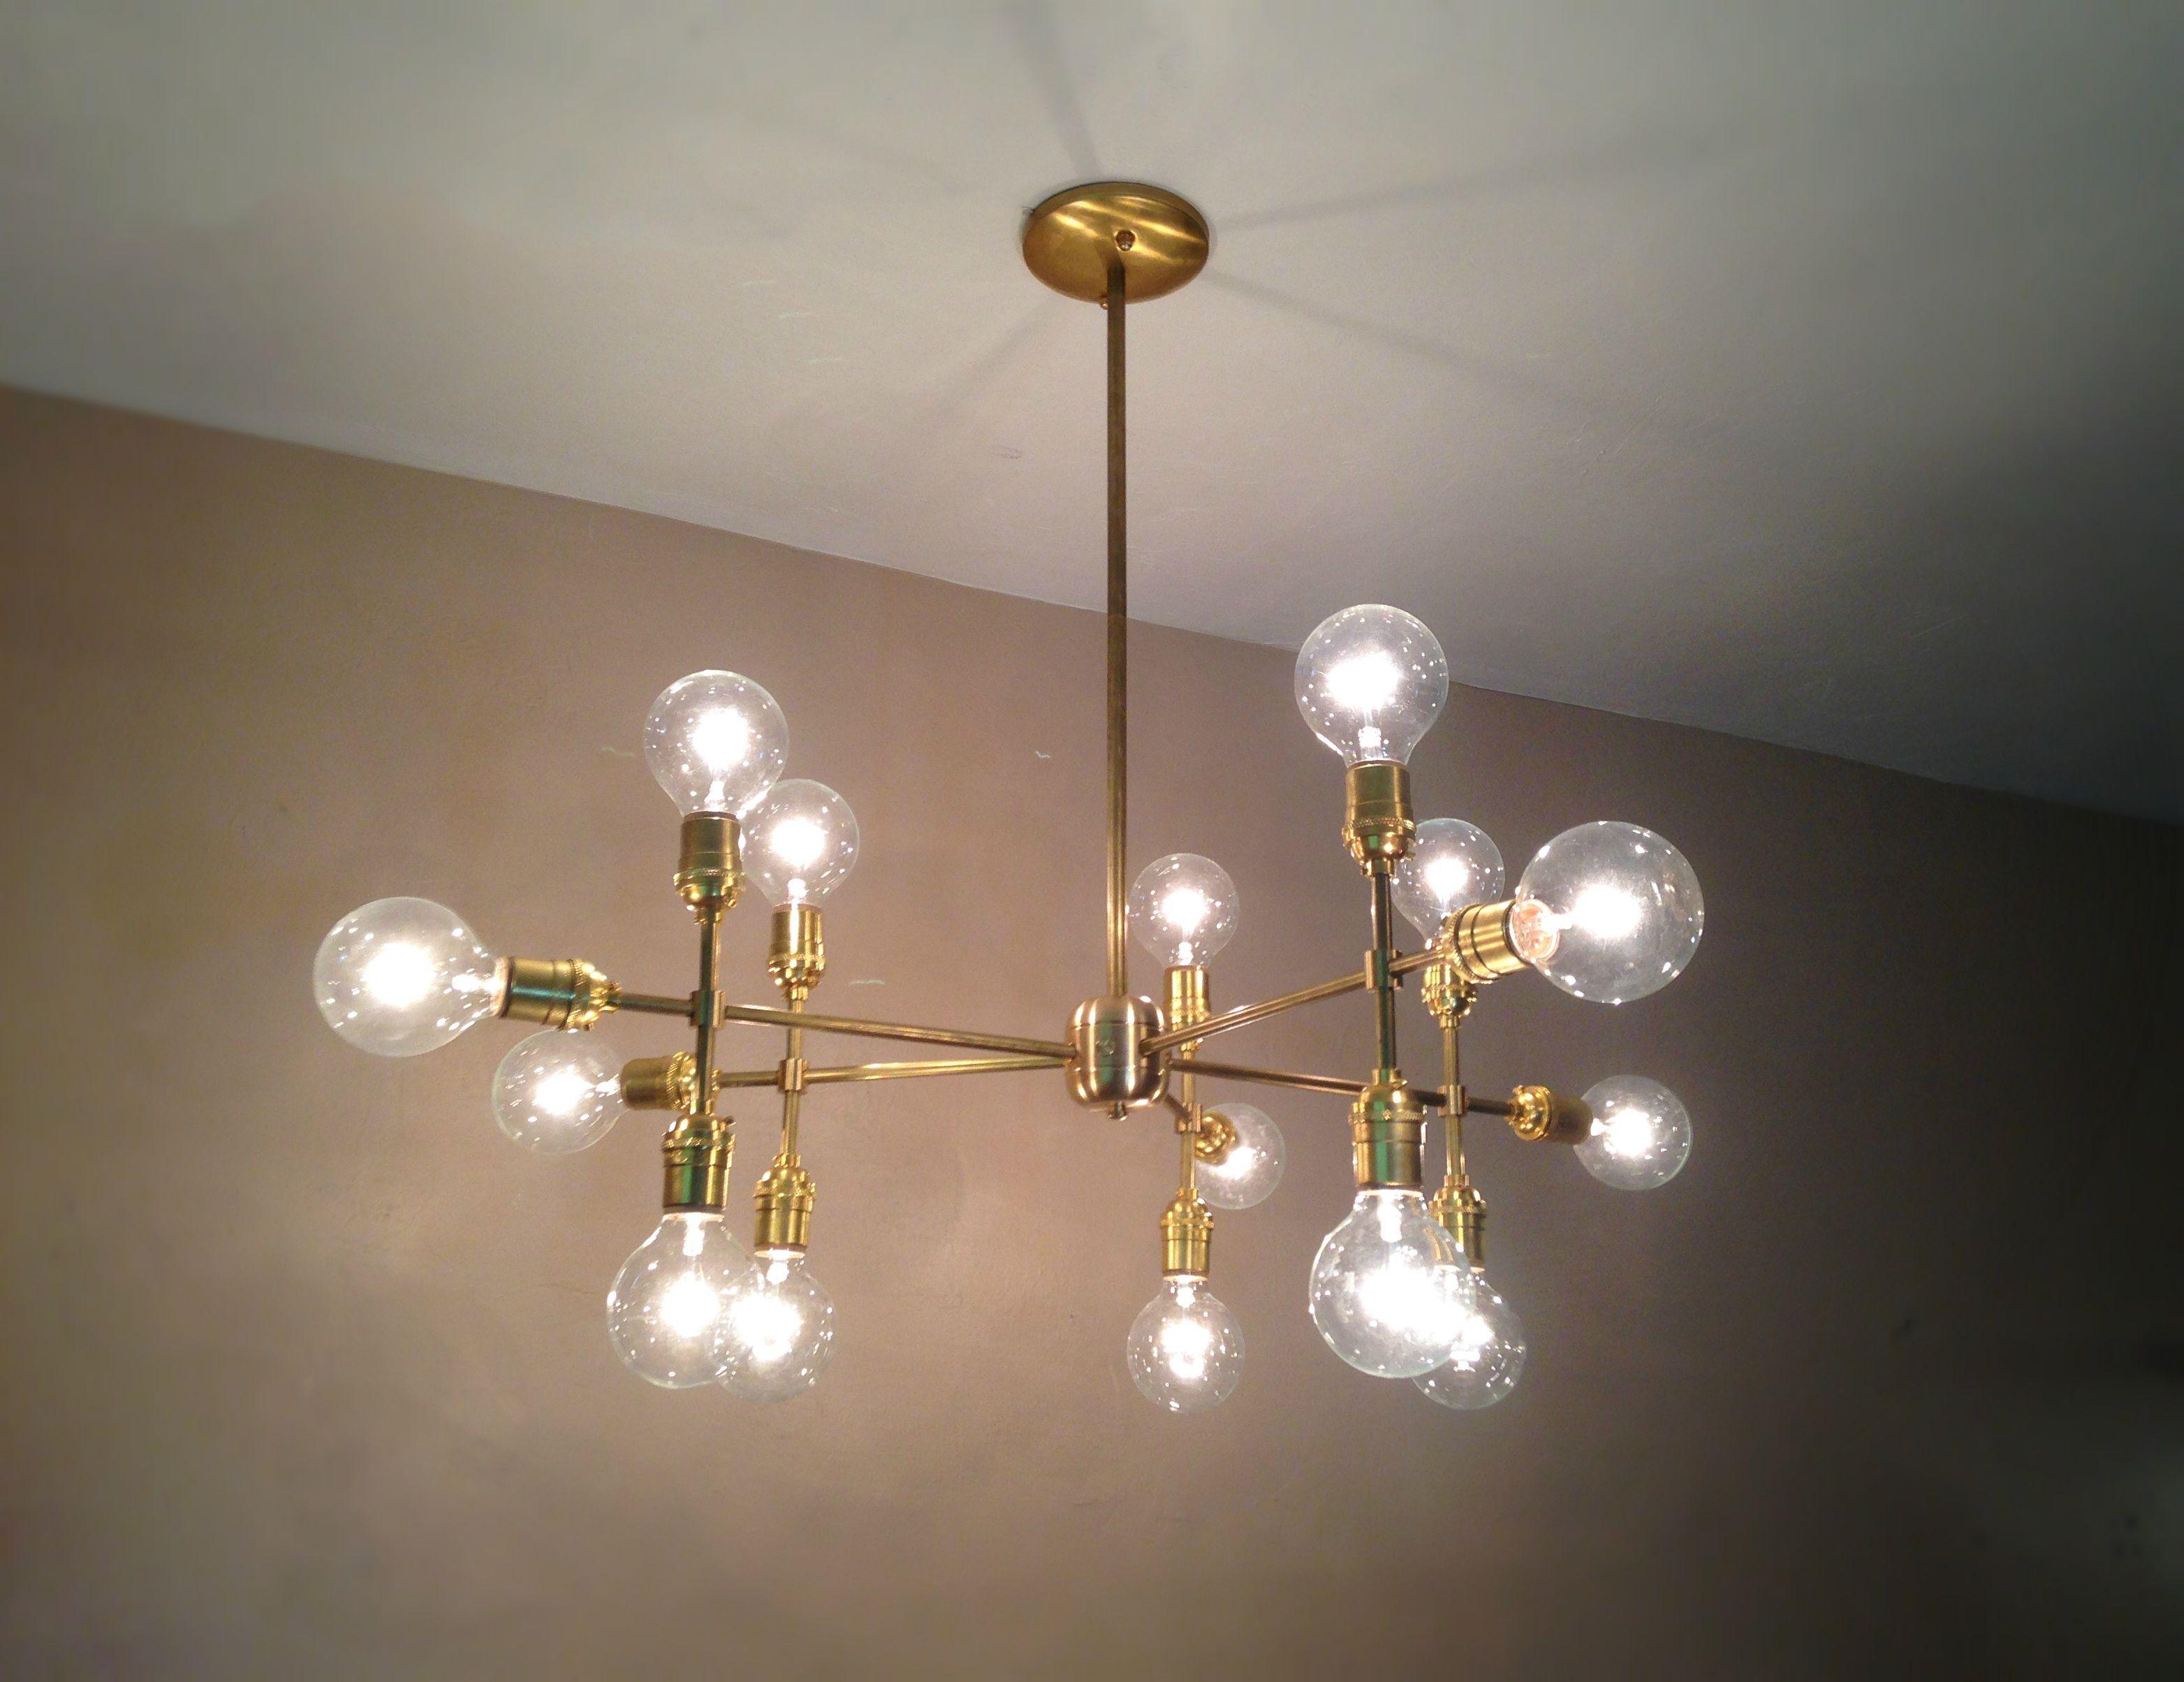 Jay lana retro steam works cape coral fl modern contemporary light piano light multiple light edison bulb chandelier lamp arubaitofo Image collections